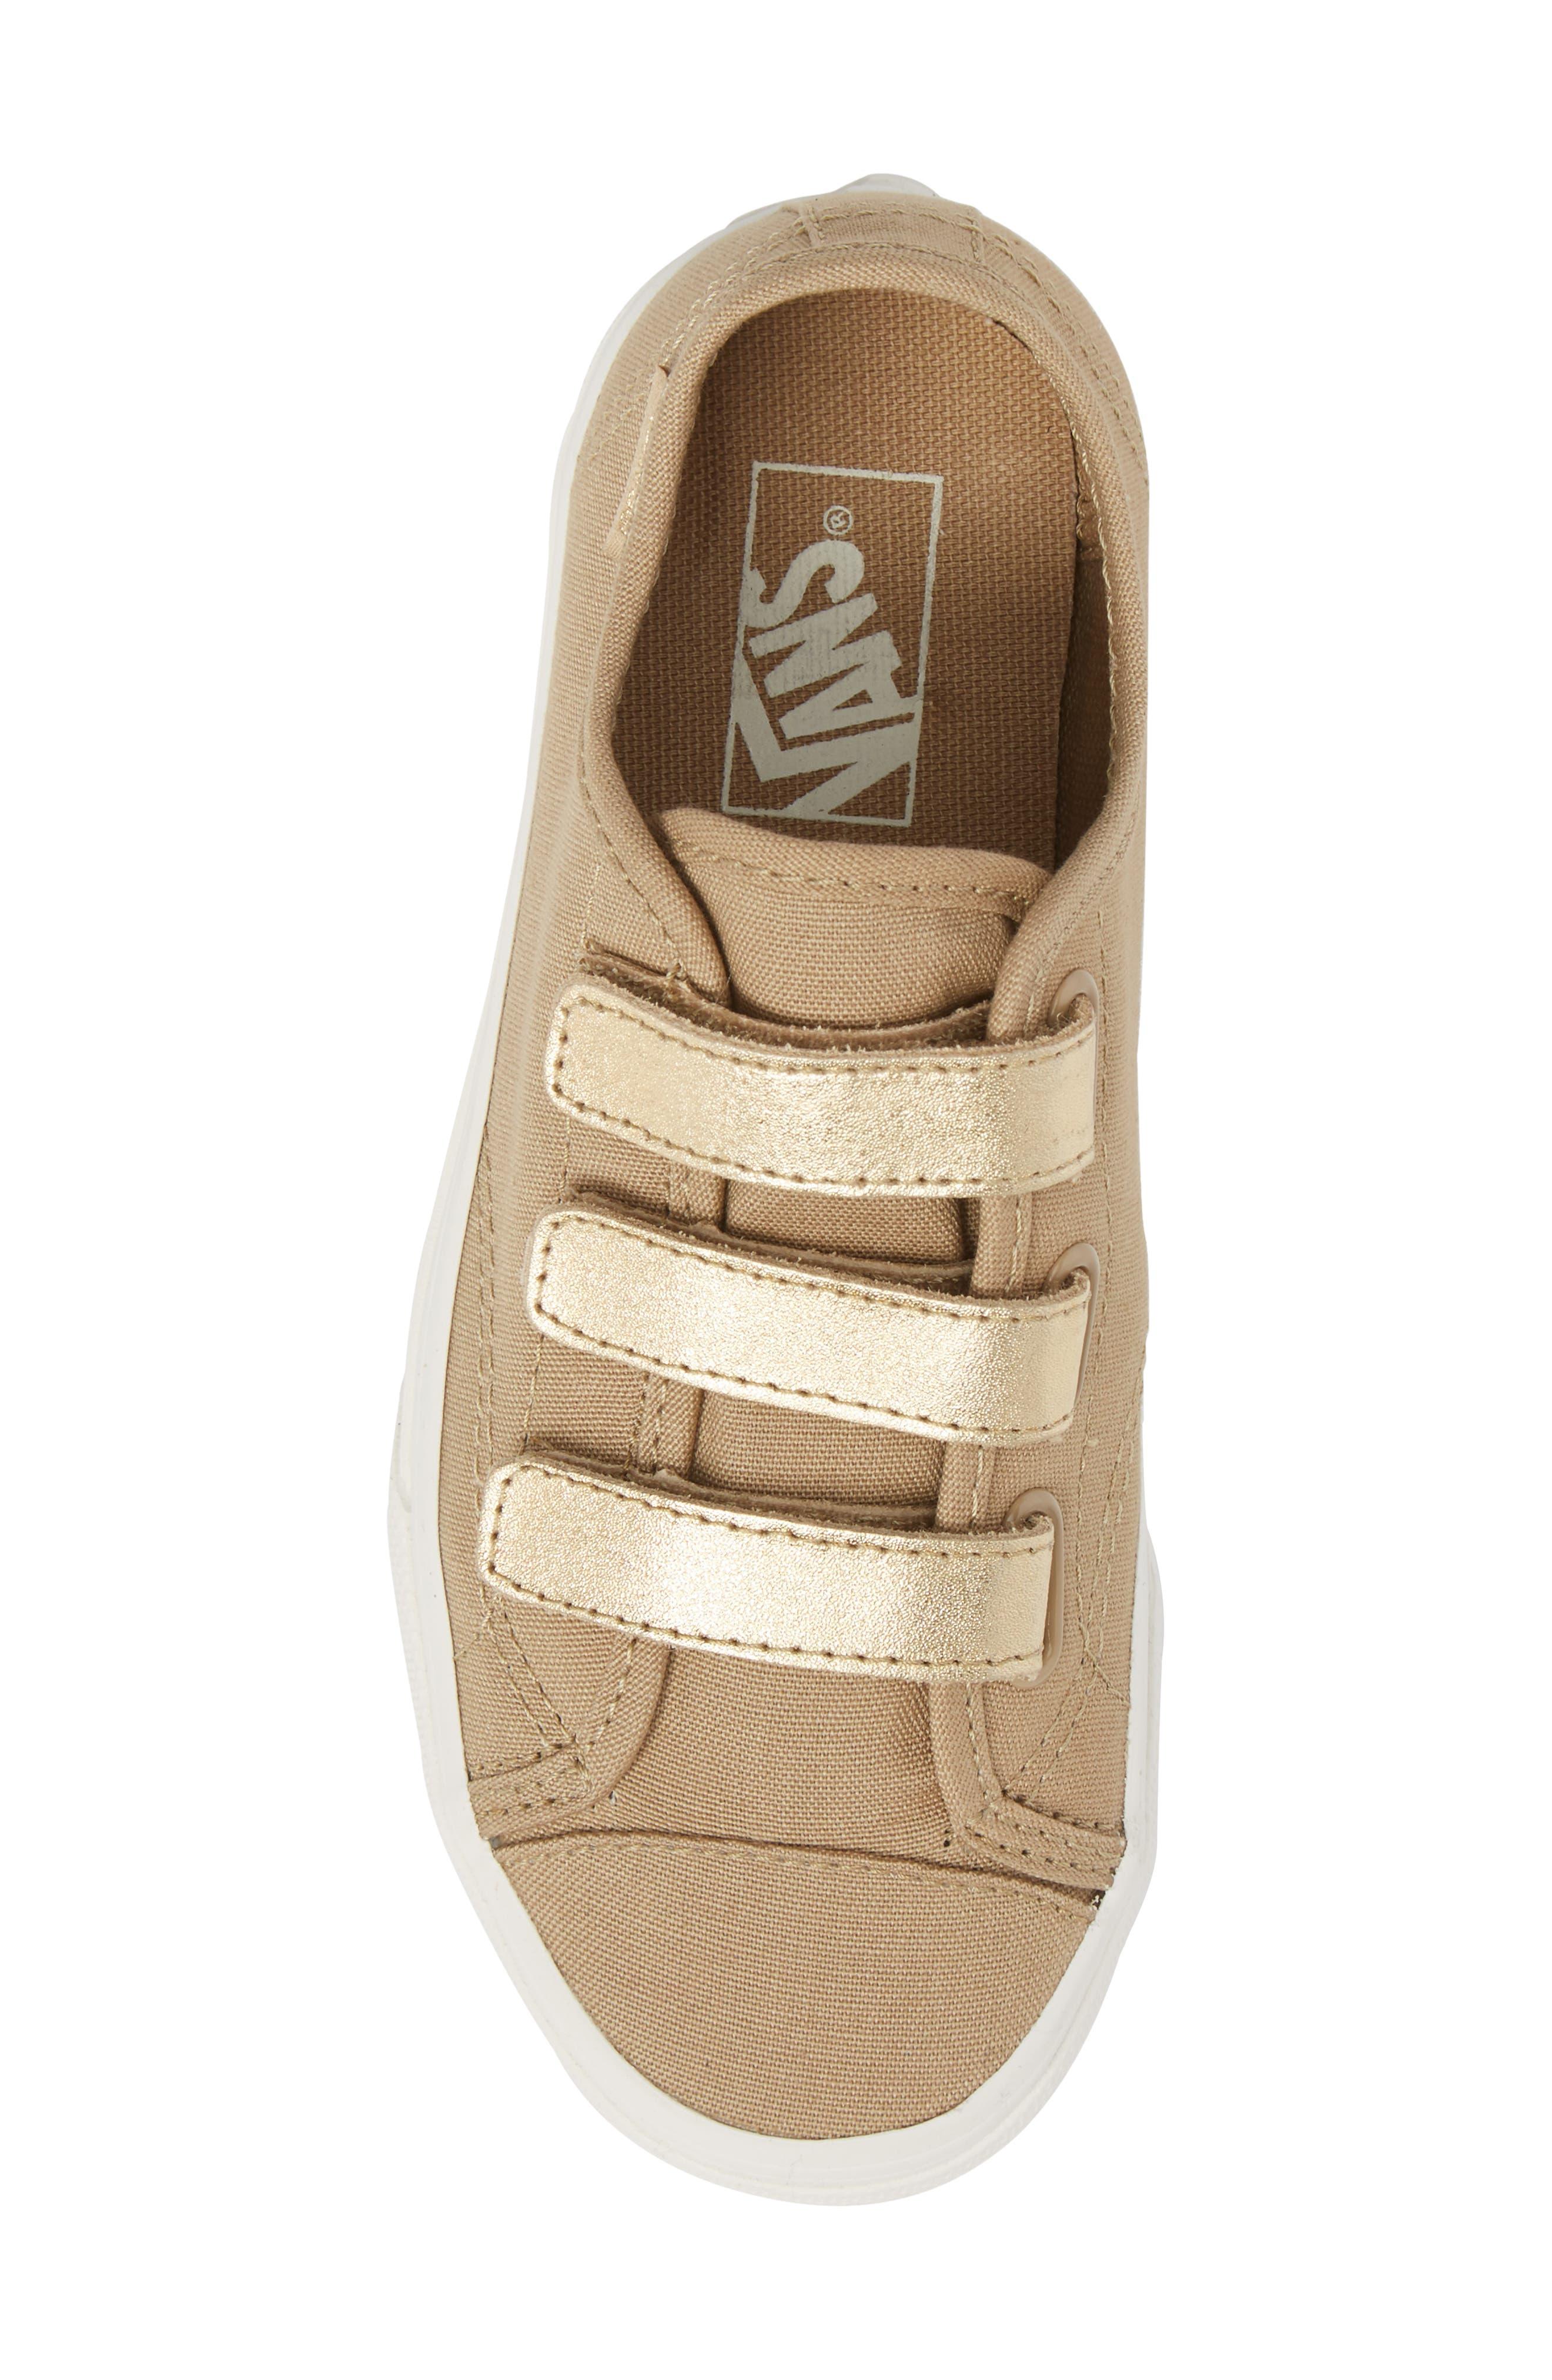 Style 23V Sneaker,                             Alternate thumbnail 5, color,                             Metallic/ Cornstalk